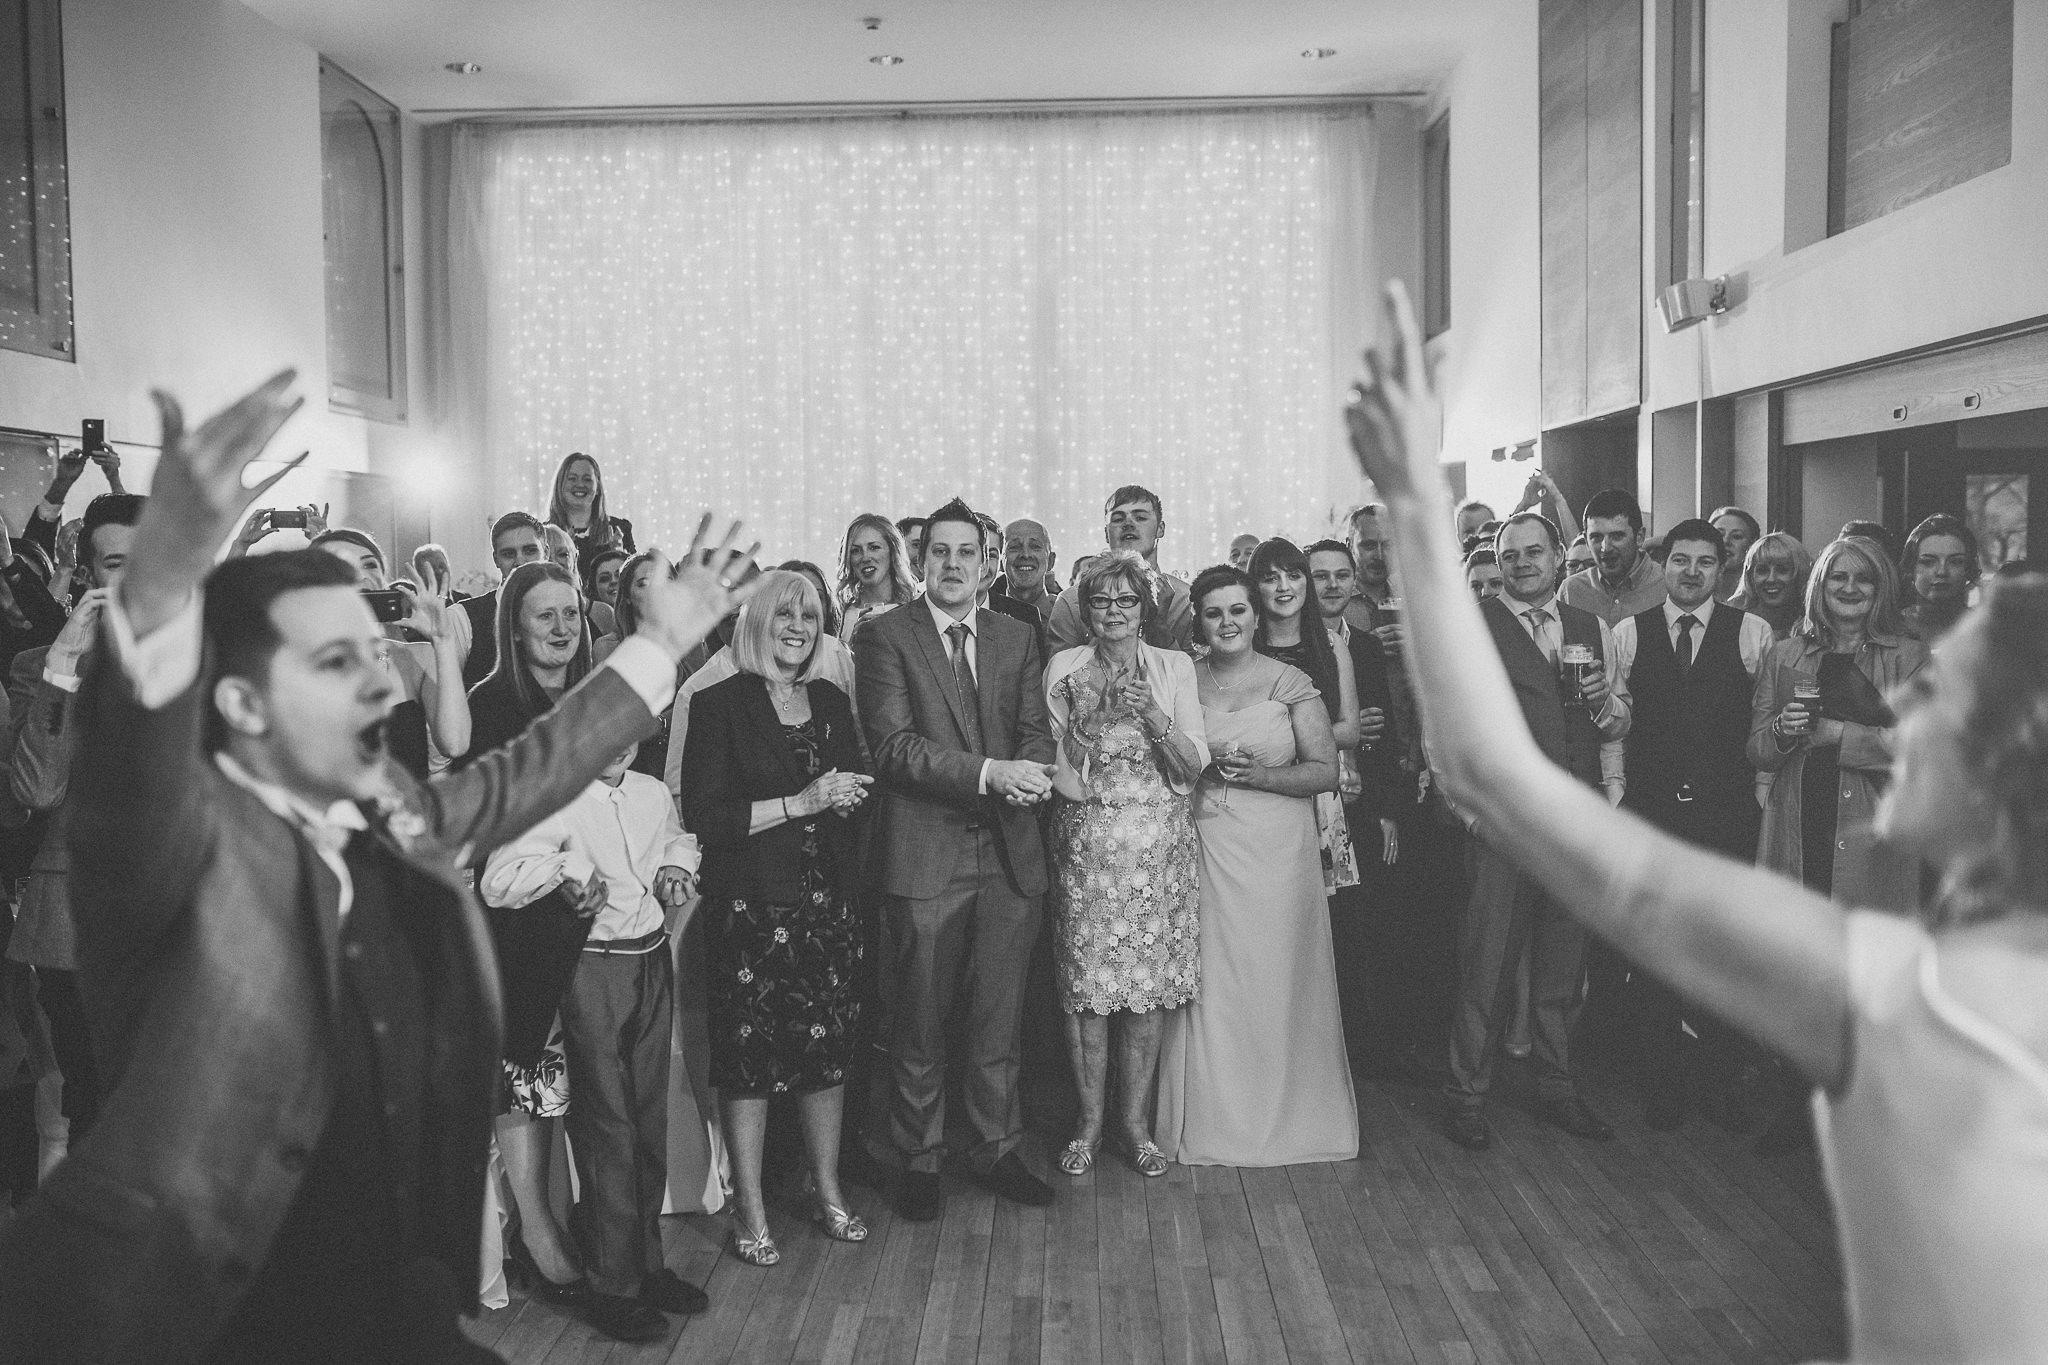 Lancashire-Creative-natural-documentary-wedding-photography-90084